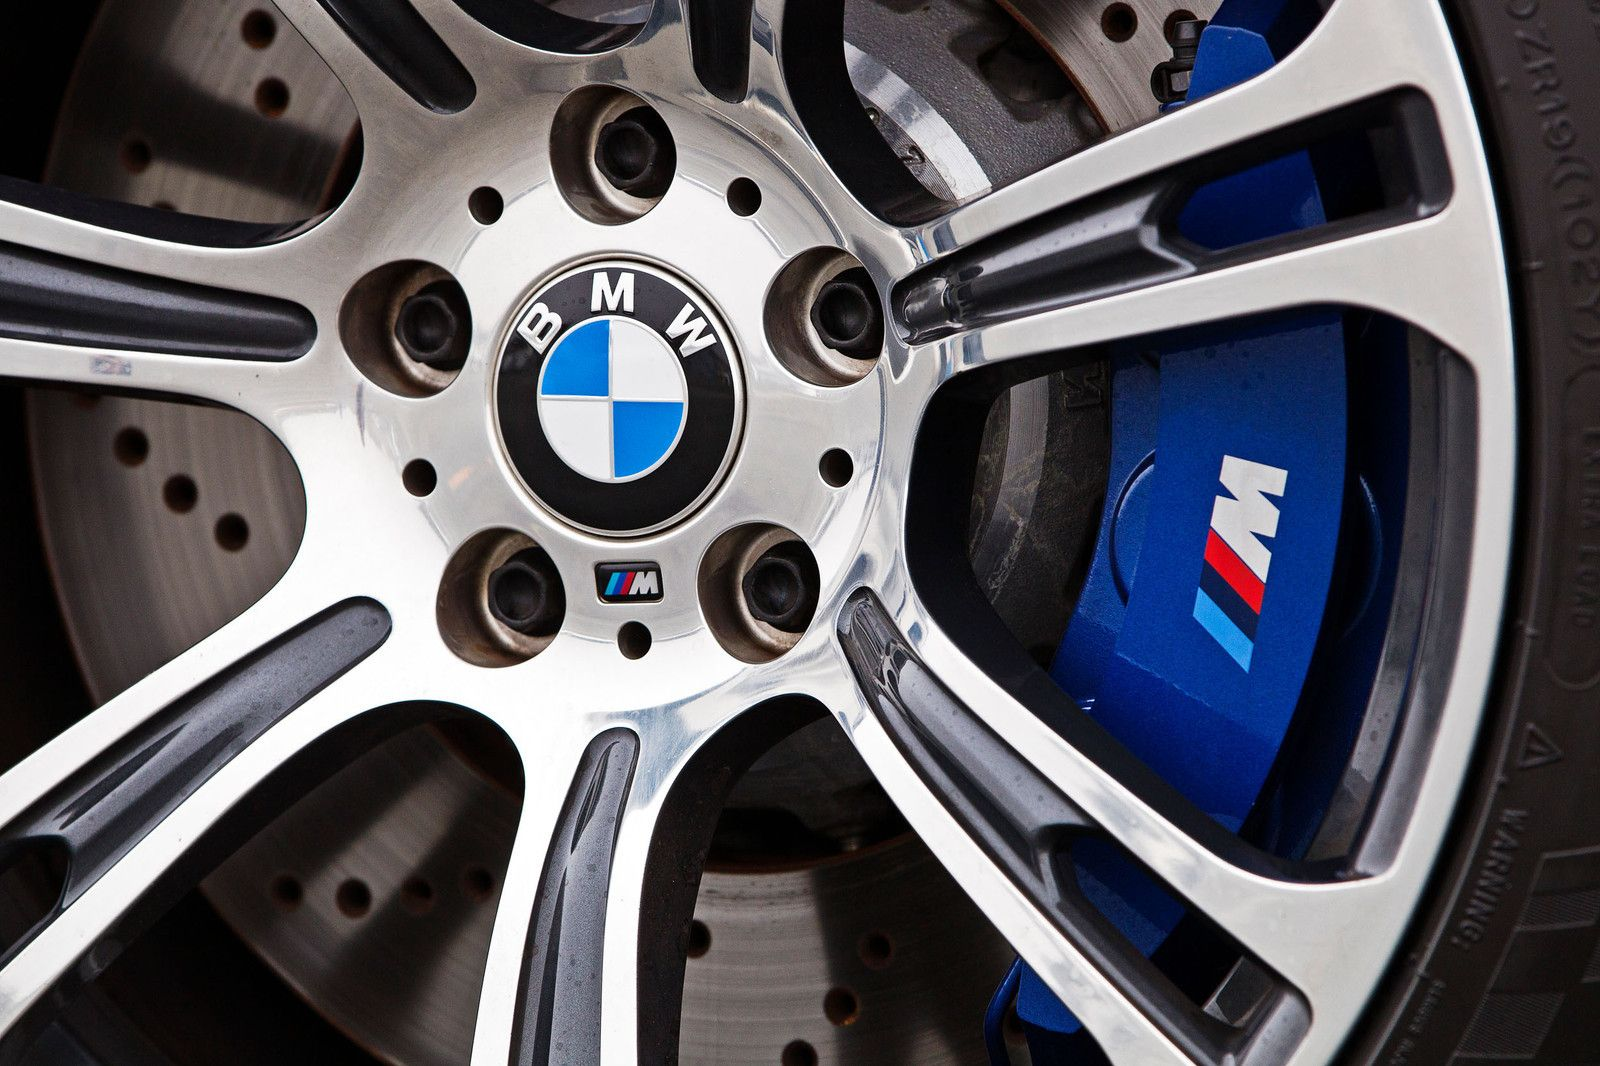 Bmw M Brake Caliper Decal Blue Calipers Bmw Bmw M6 Coupe Bmw M6